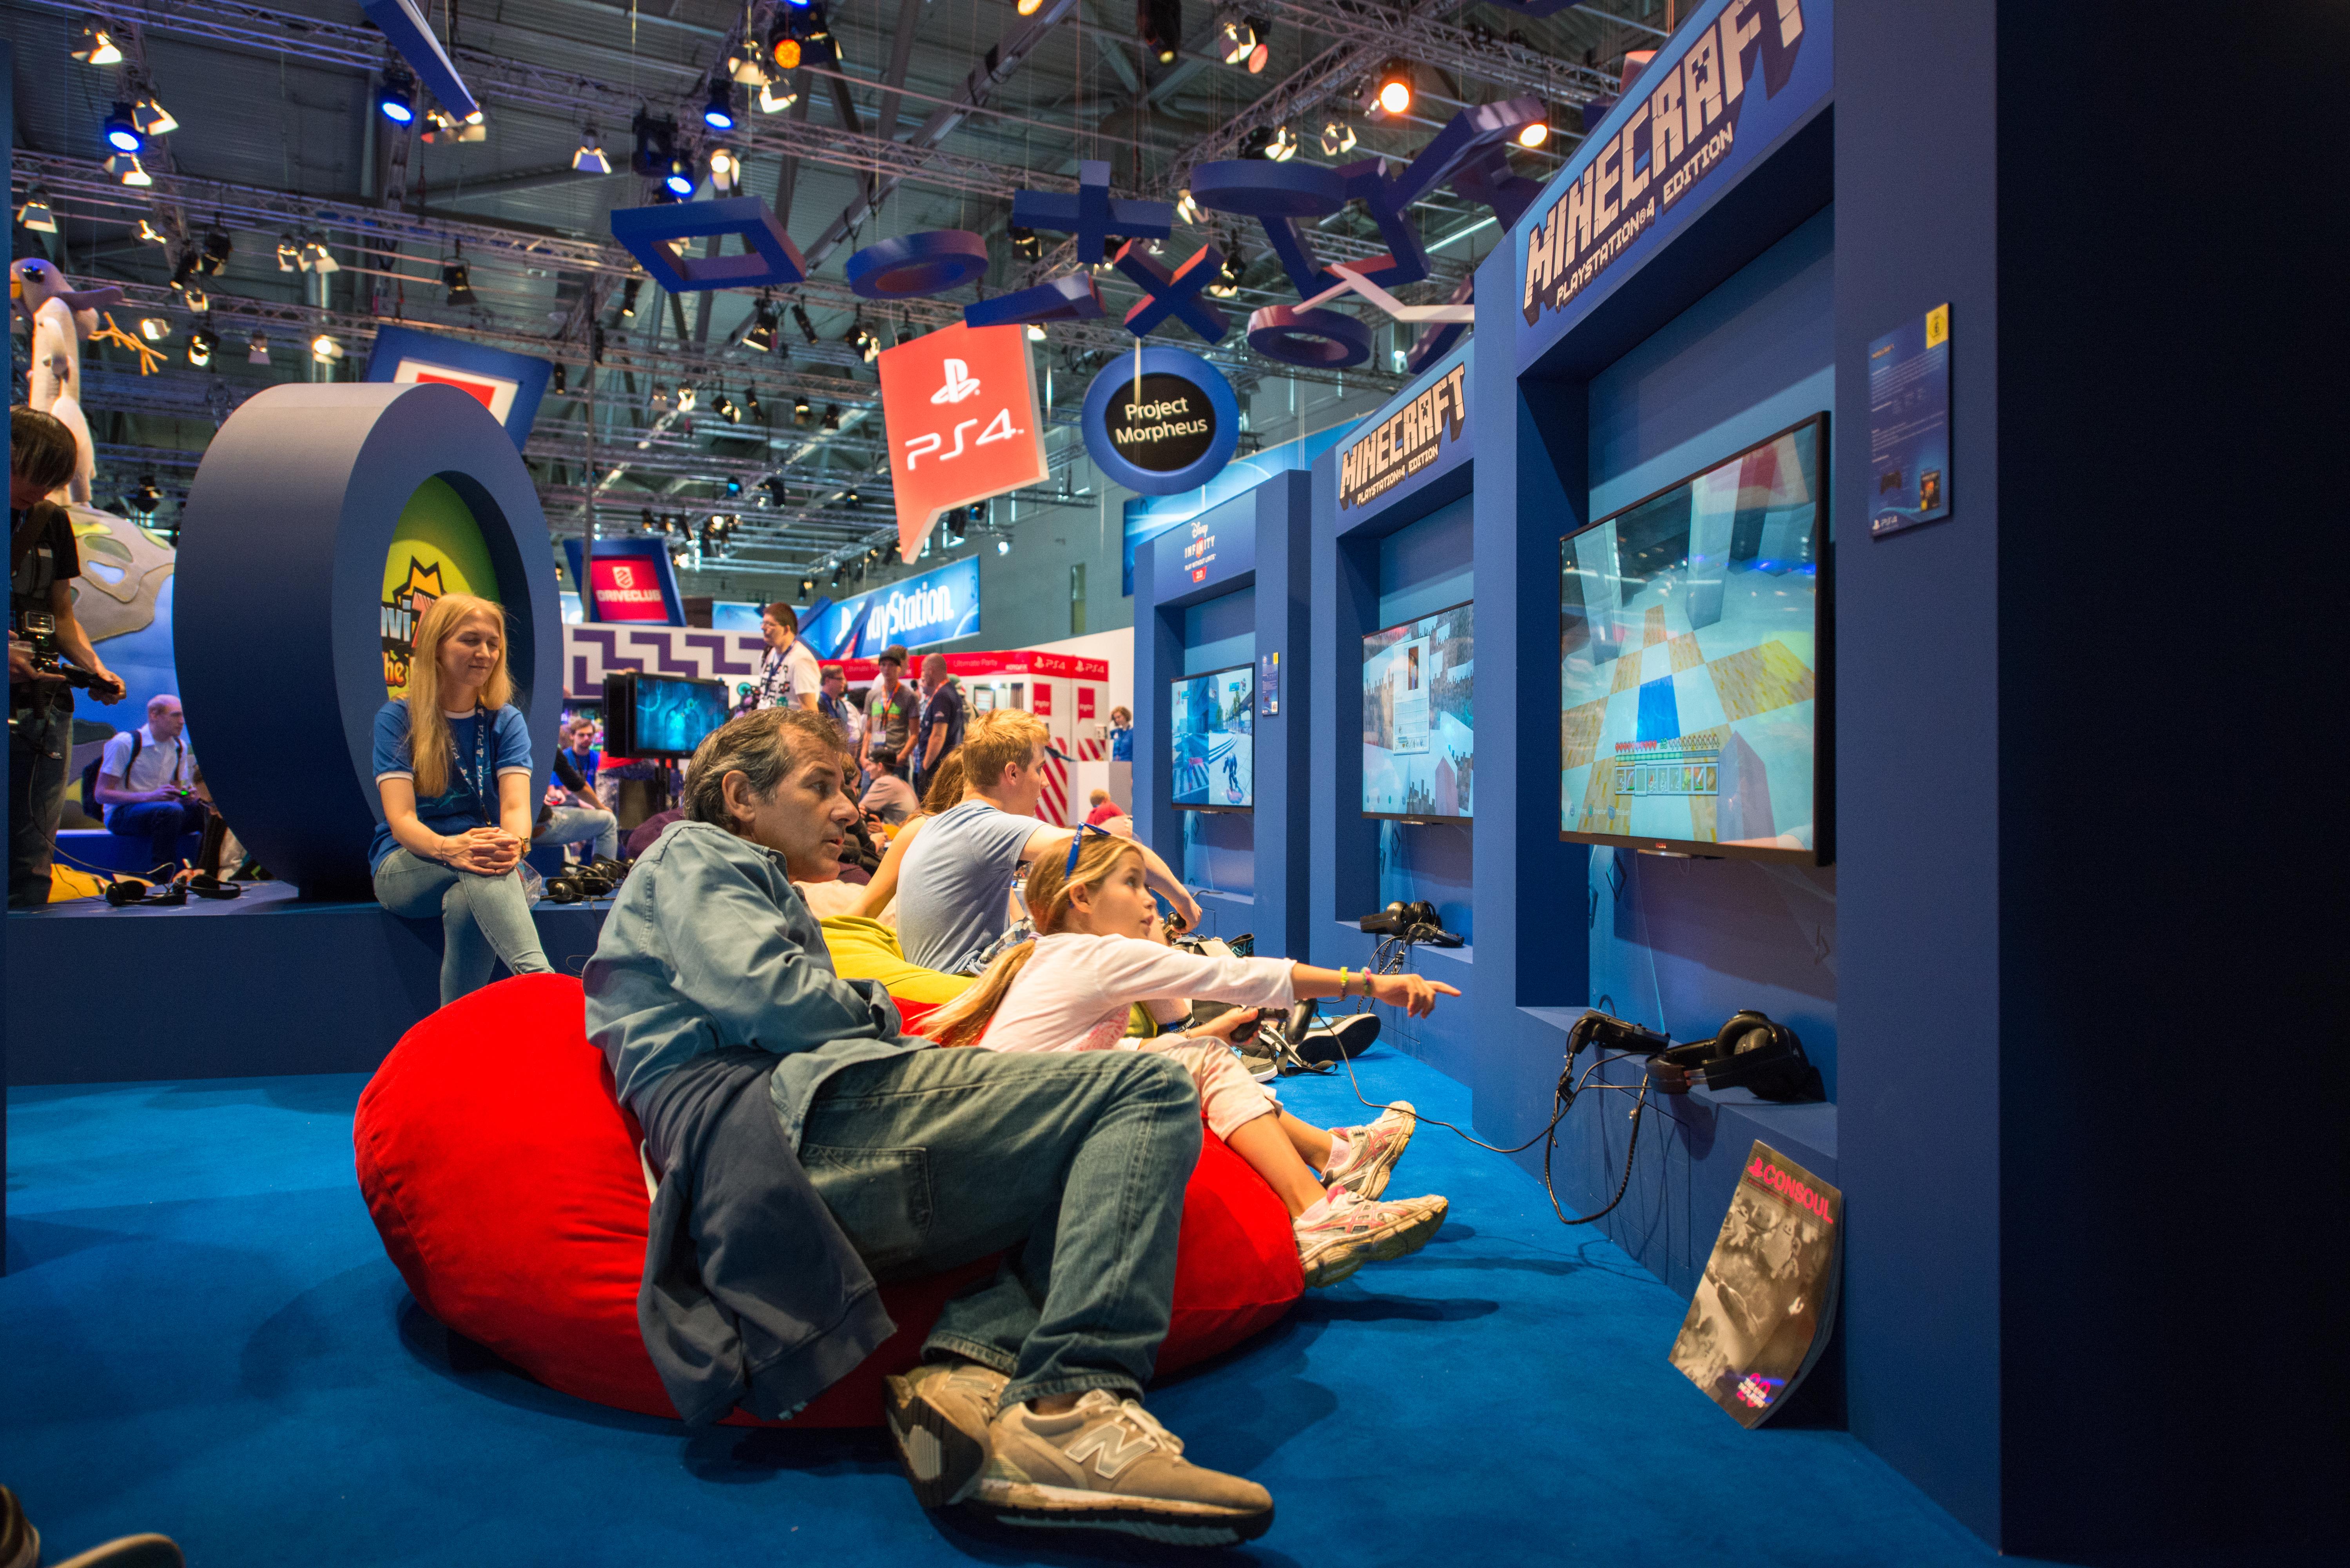 Minecraft gaming shutterstock_662137753